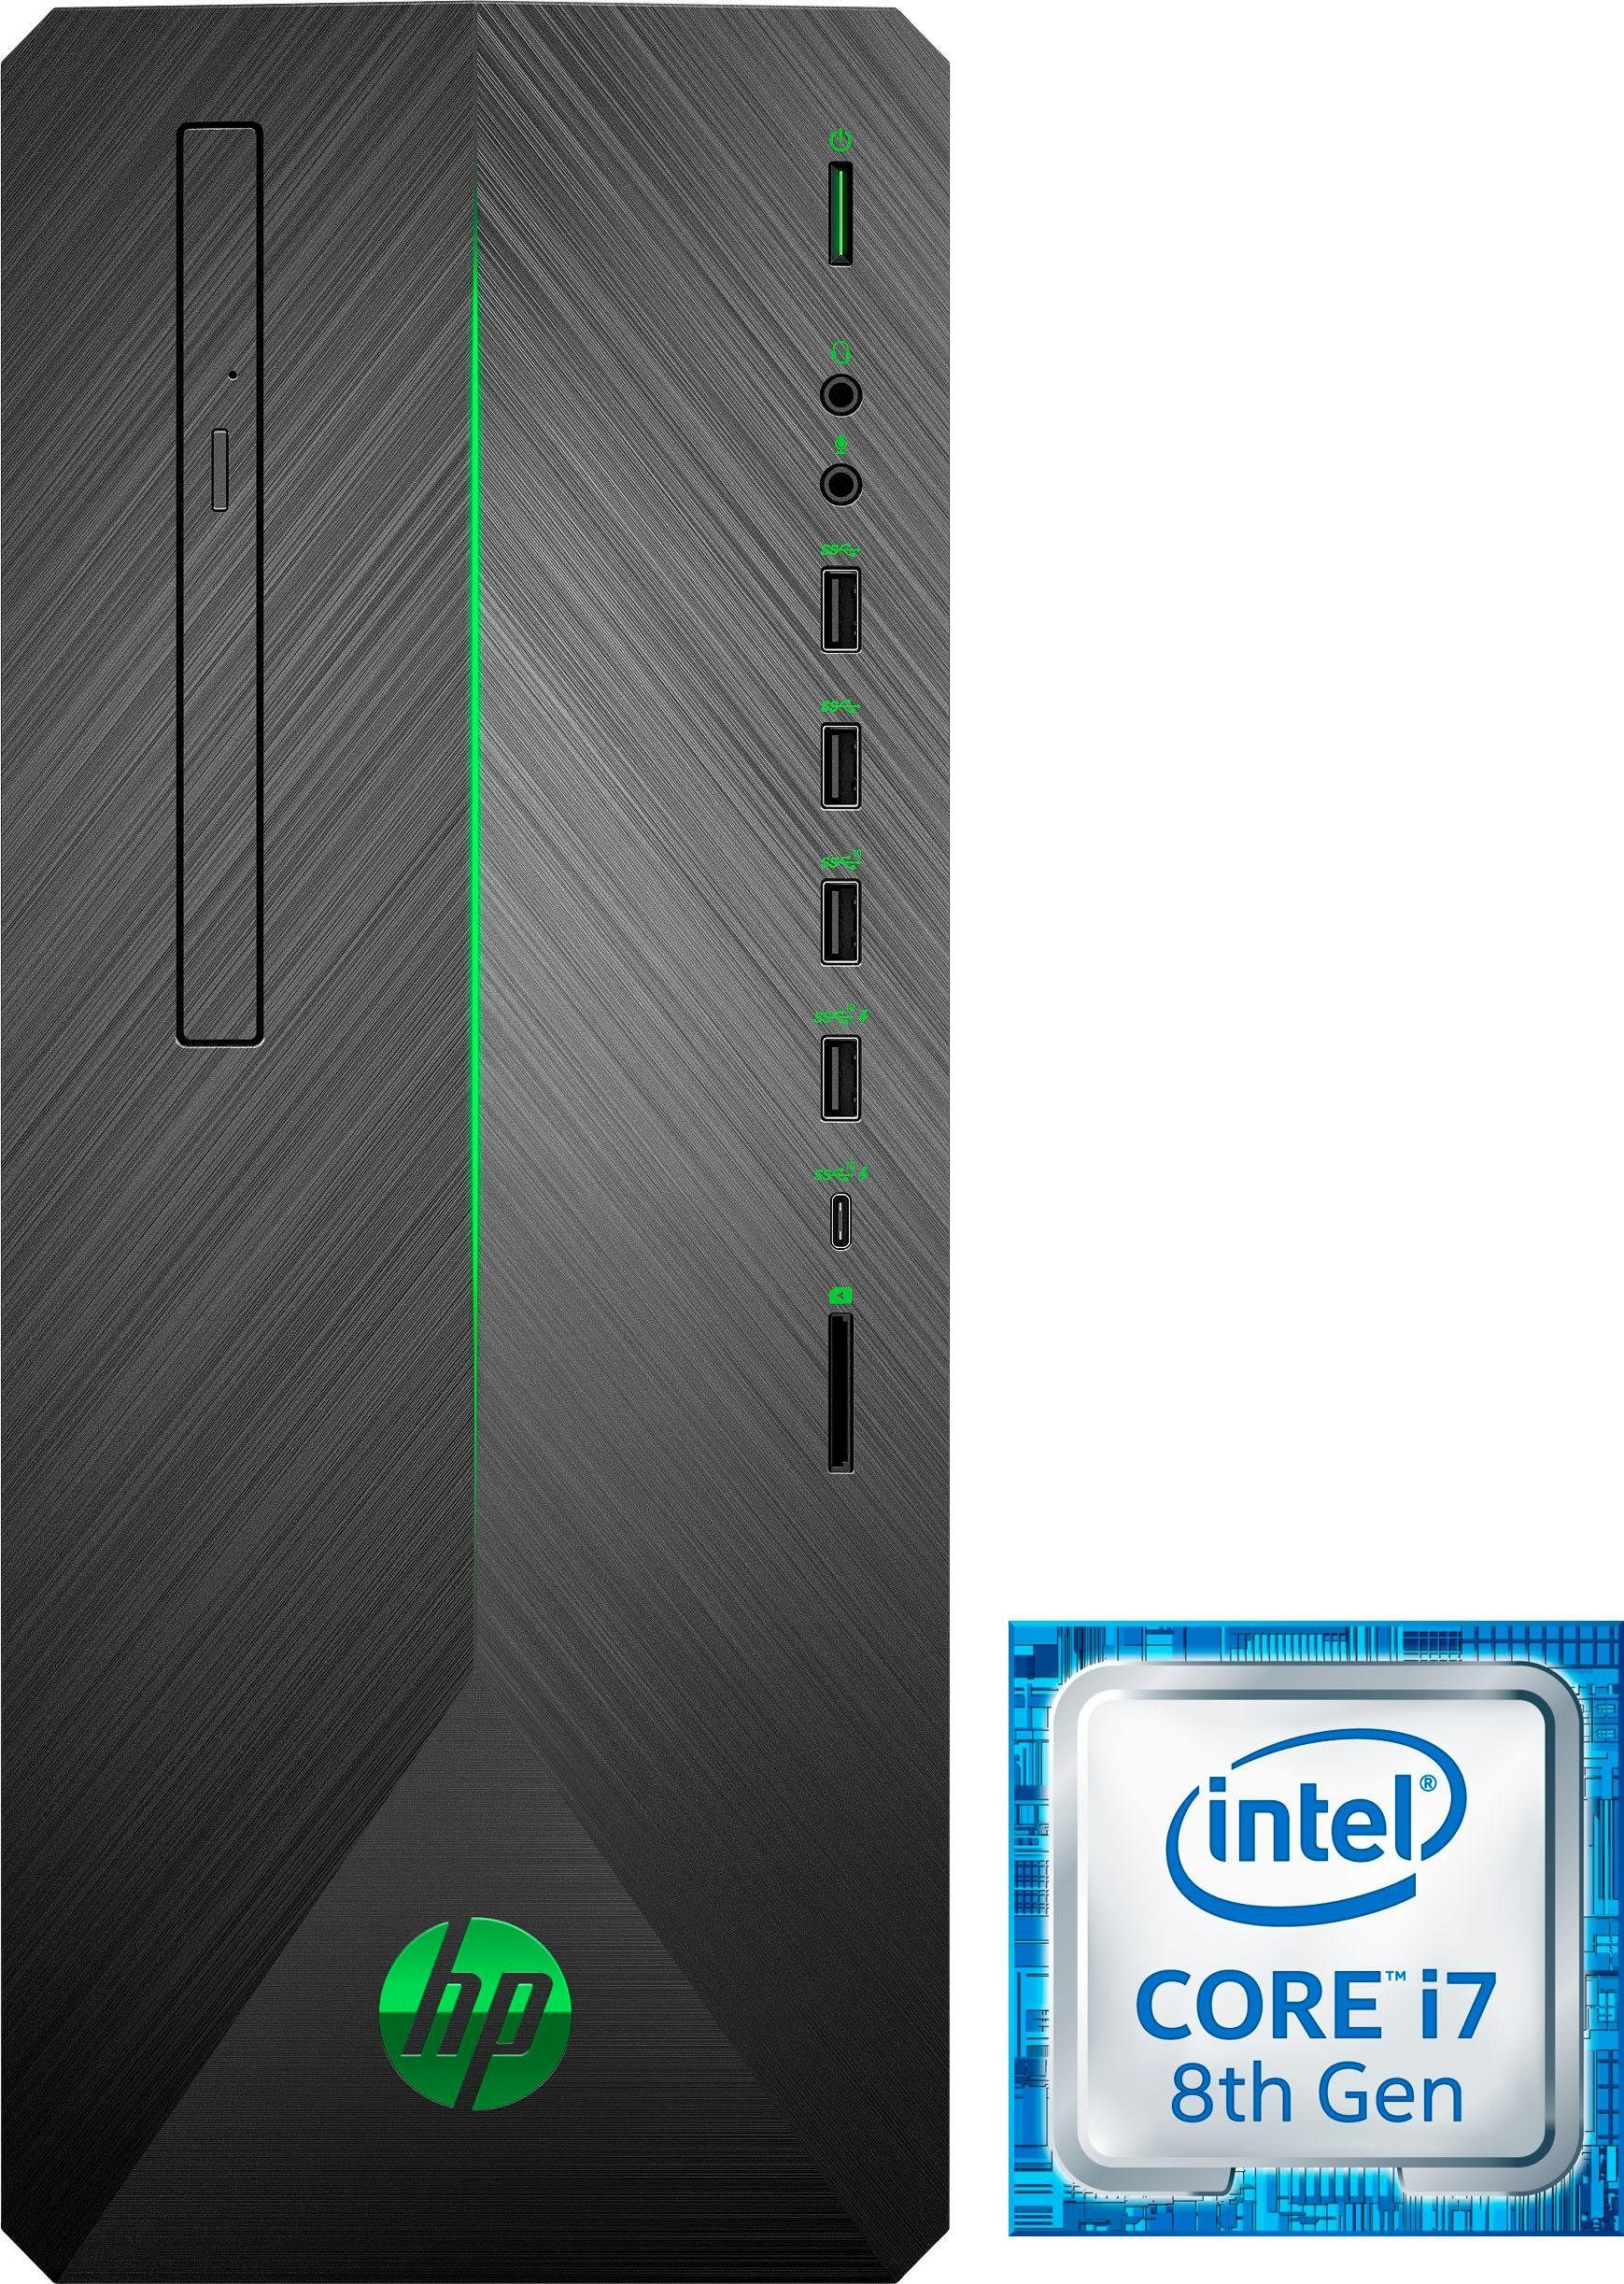 HP Pavilion 790-0501ng Gaming-PC (Intel® Core i7, GeForce, 16 GB RAM, 1000 GB HDD, 256 GB SSD)